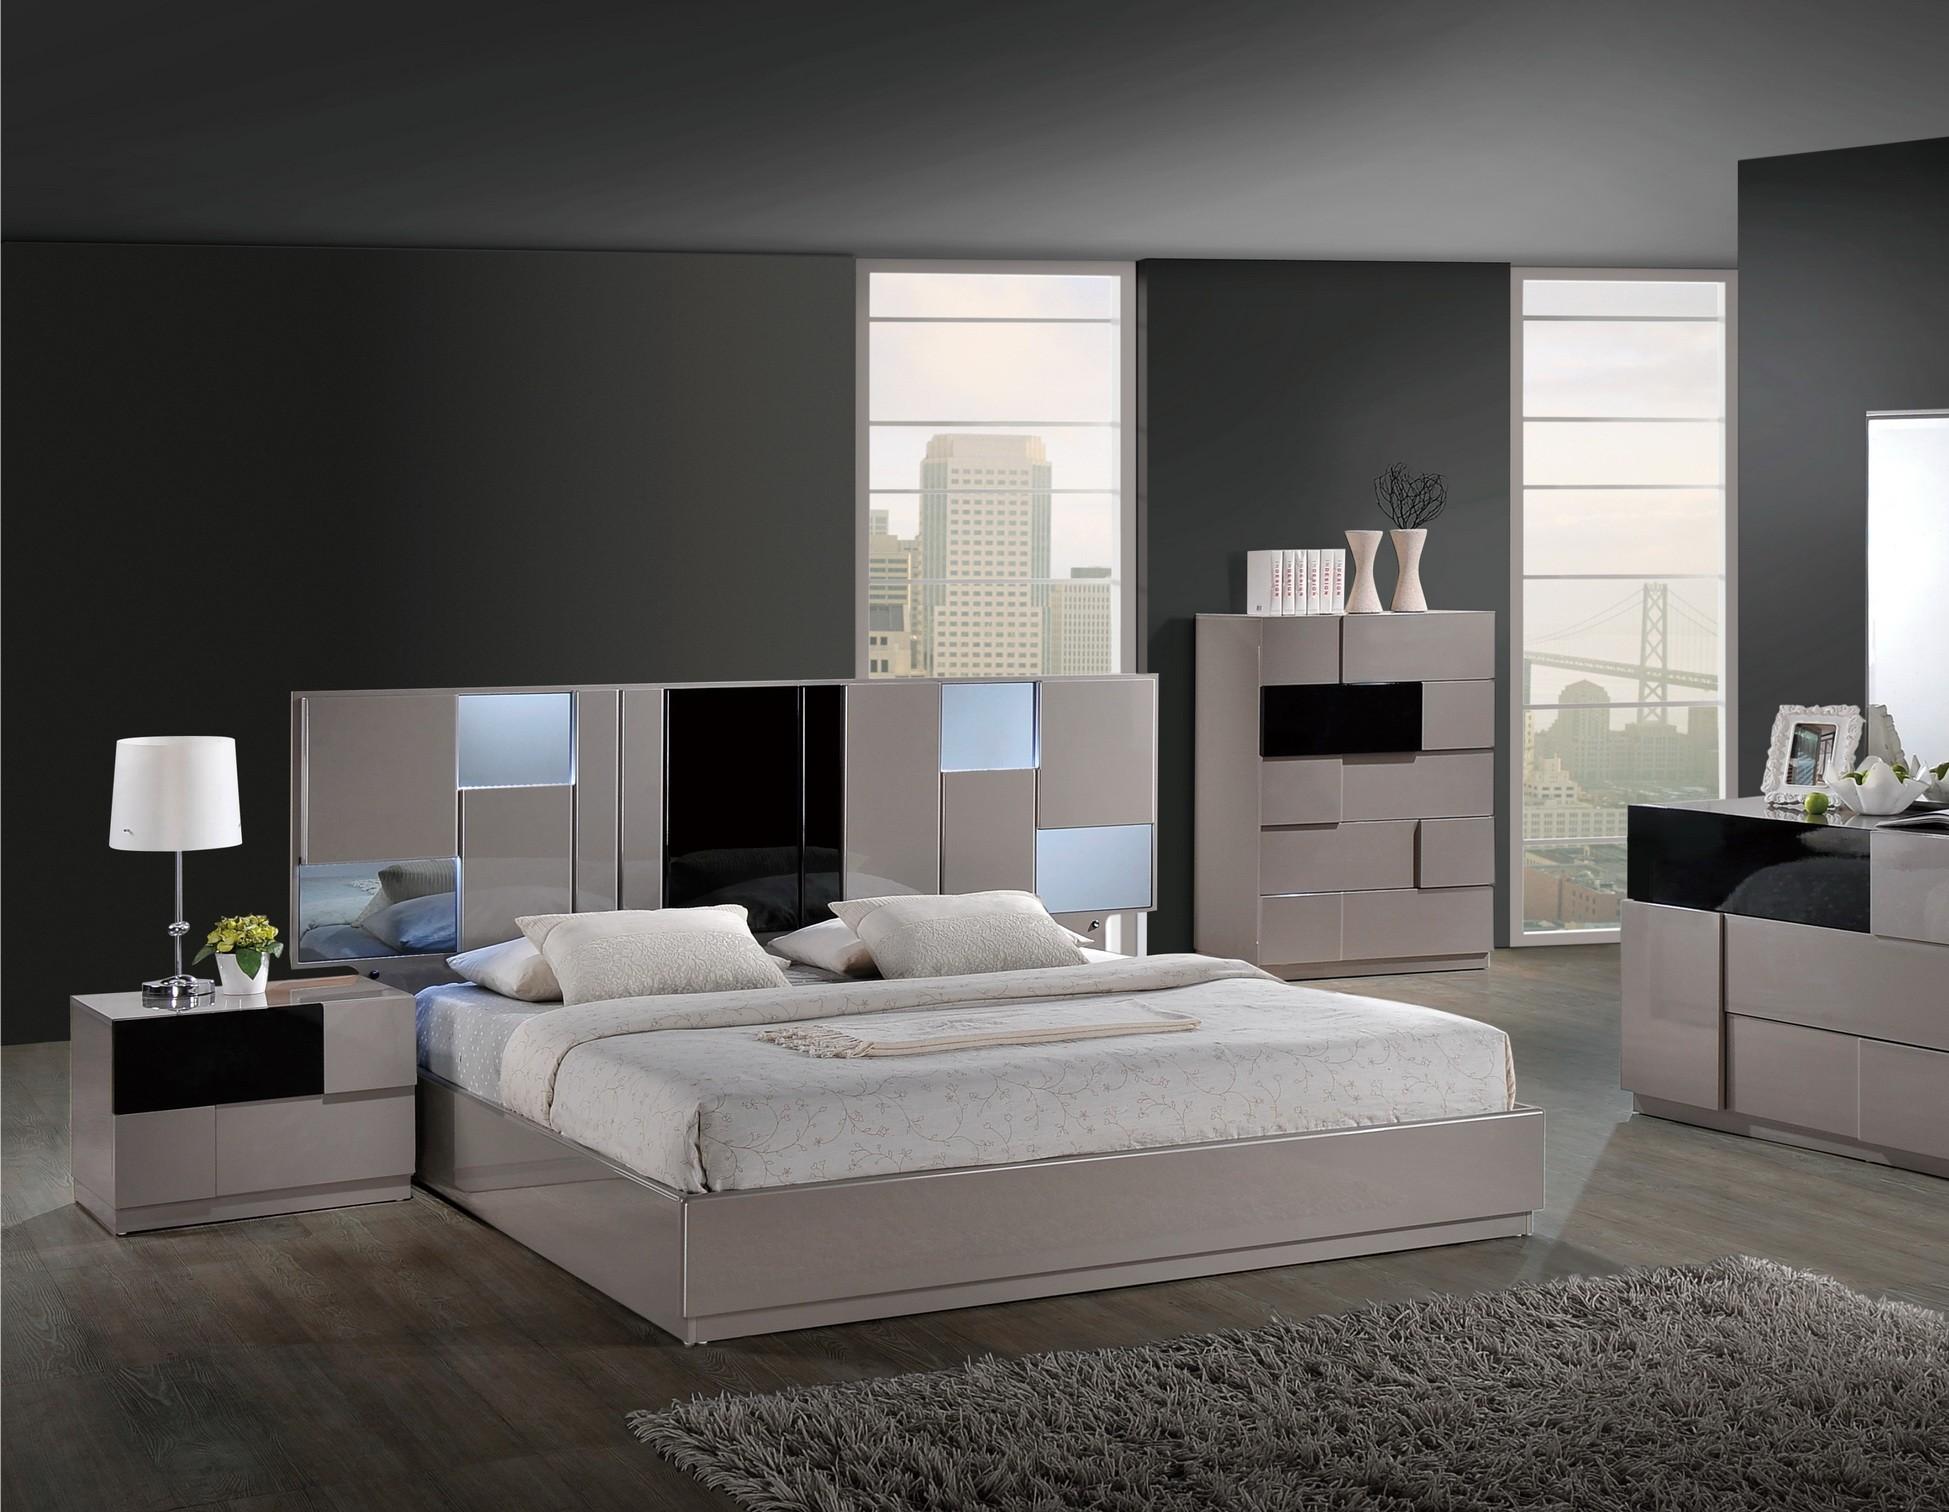 Bianca Modern Platform Bed by Global USA